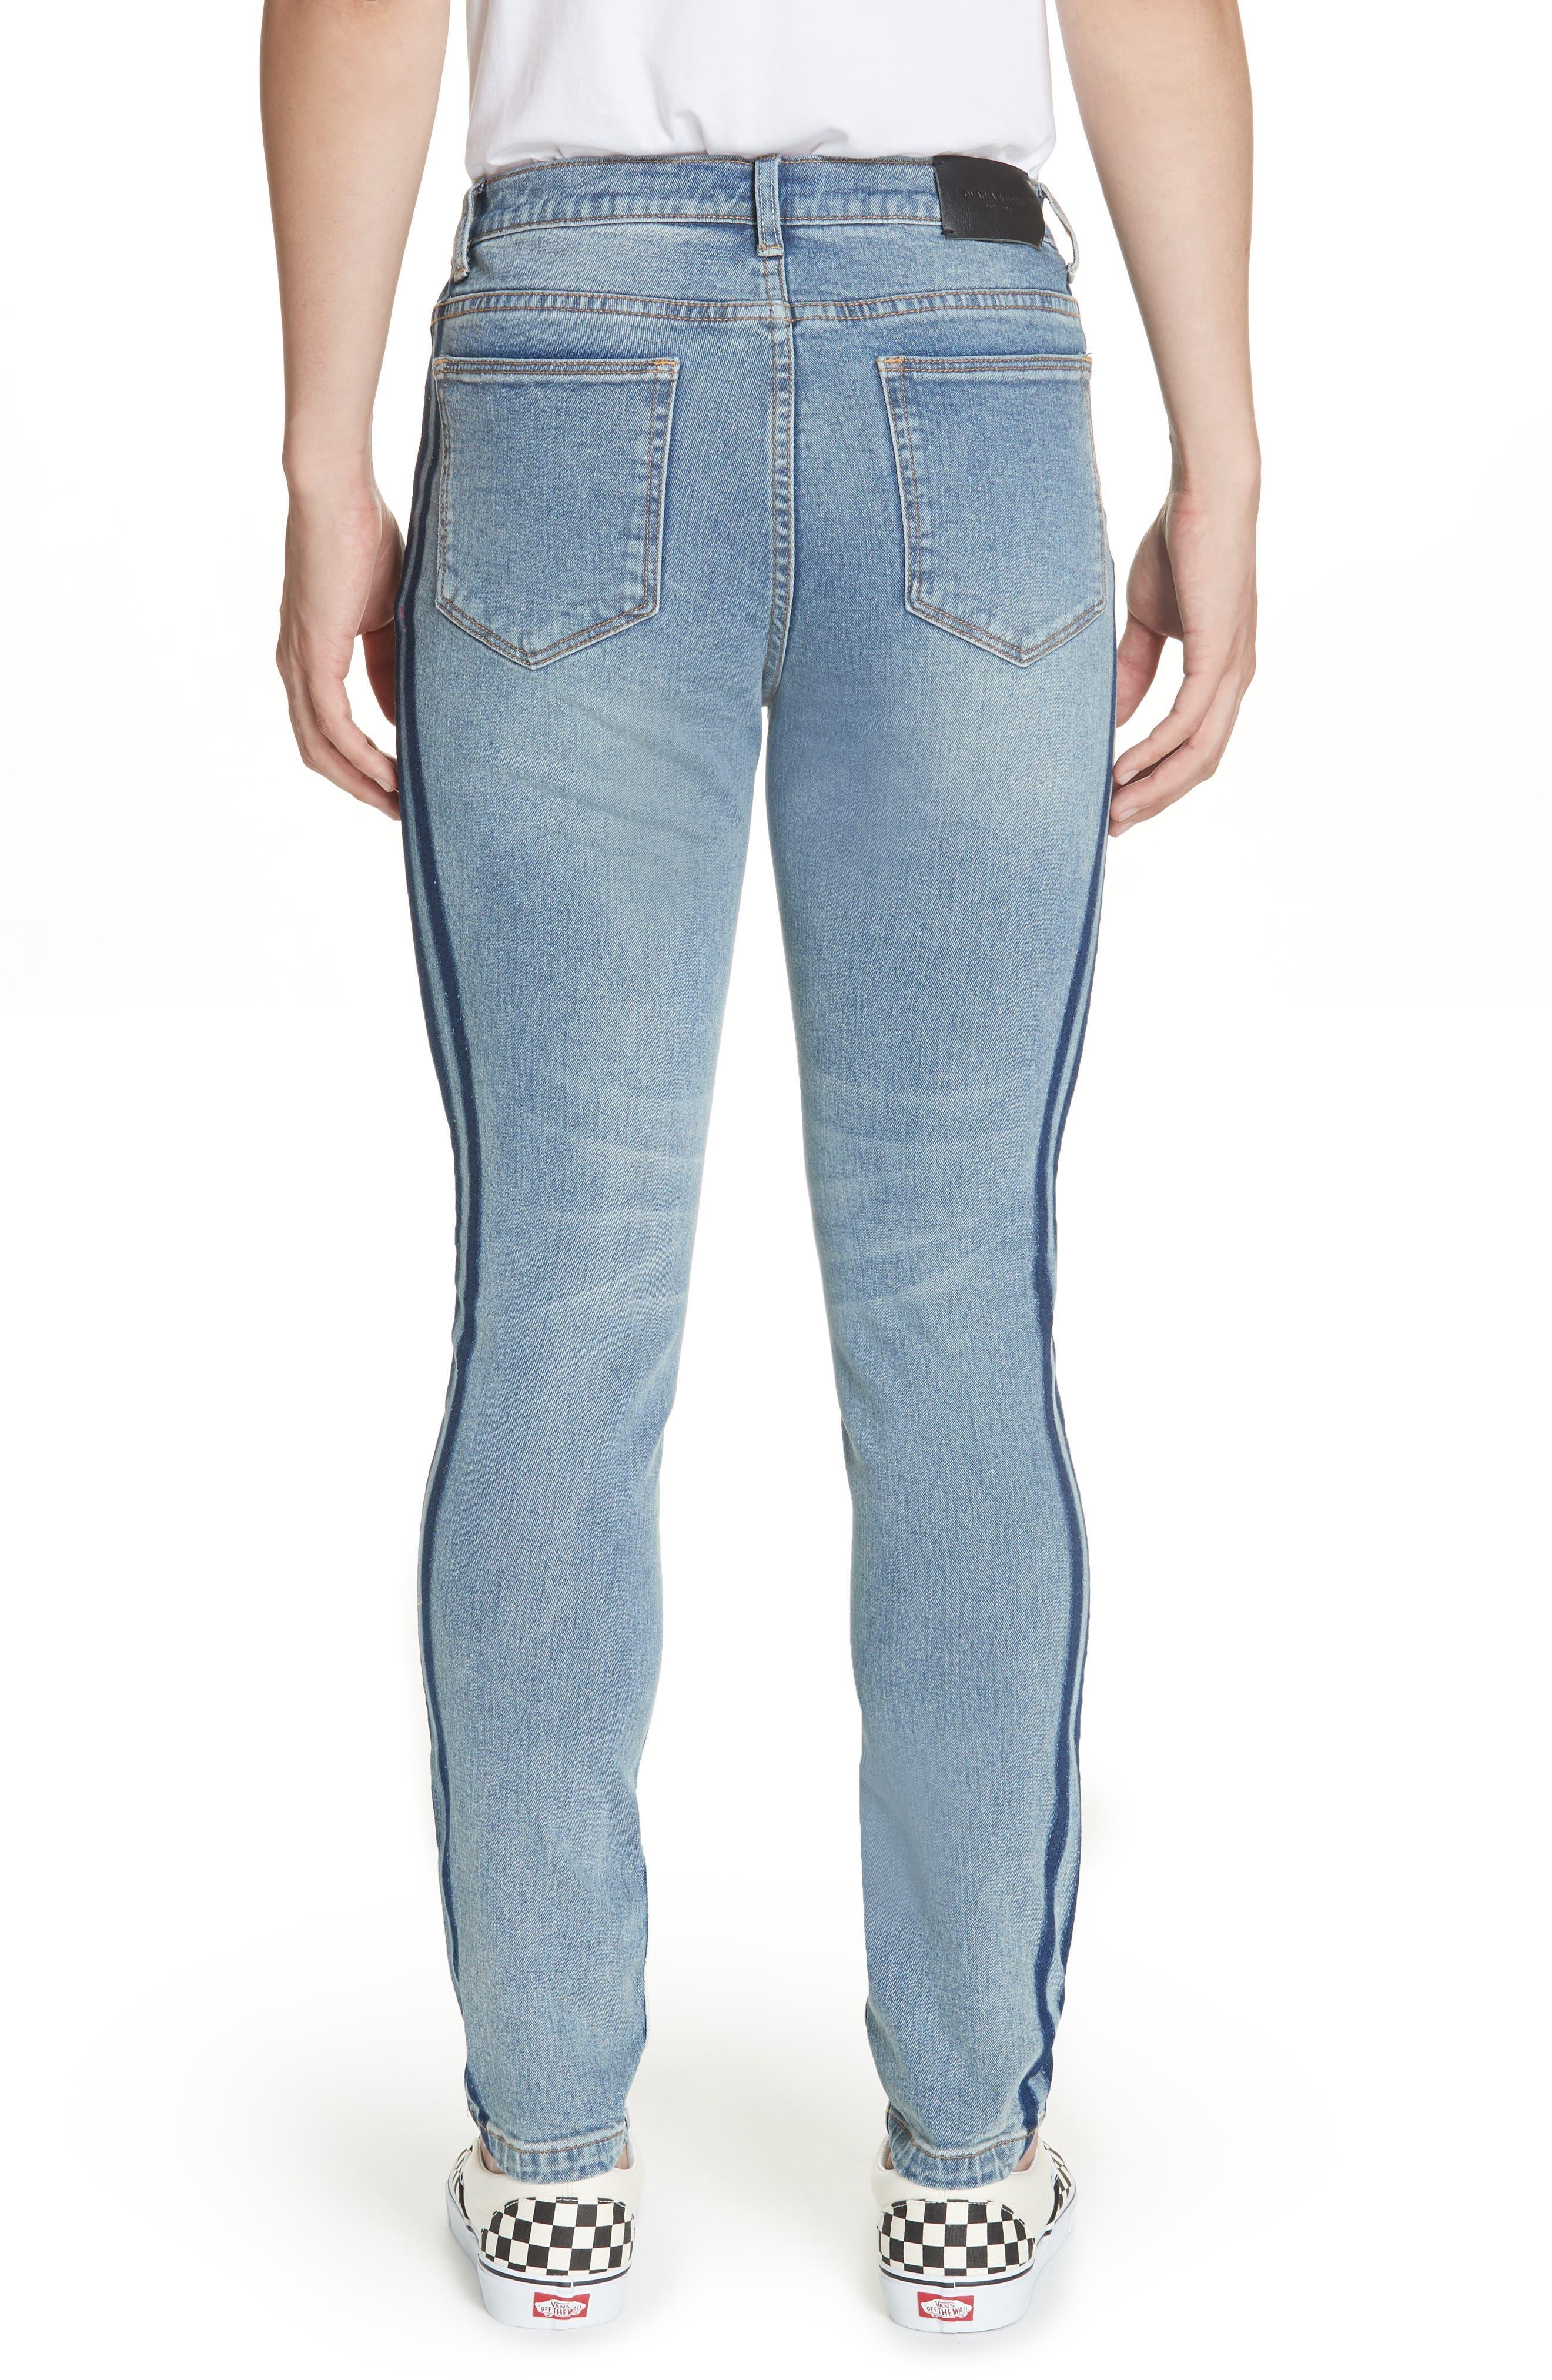 OVADIA & SONS,                             OS-1 Slim Fit Jeans,                             Alternate thumbnail 2, color,                             INDIGO